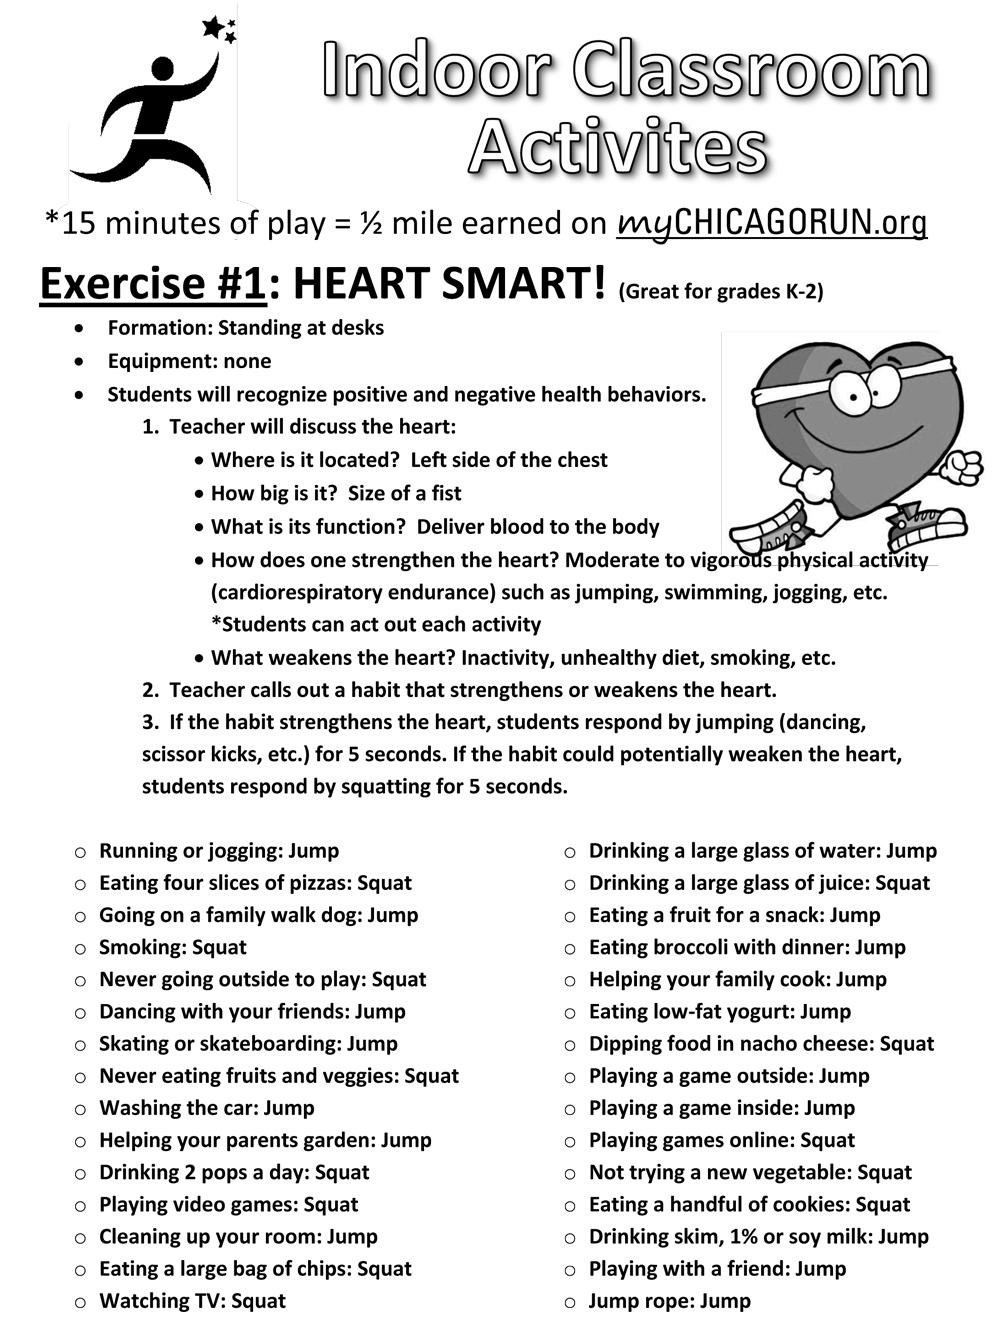 Classroom-Healthy-Games.jpg